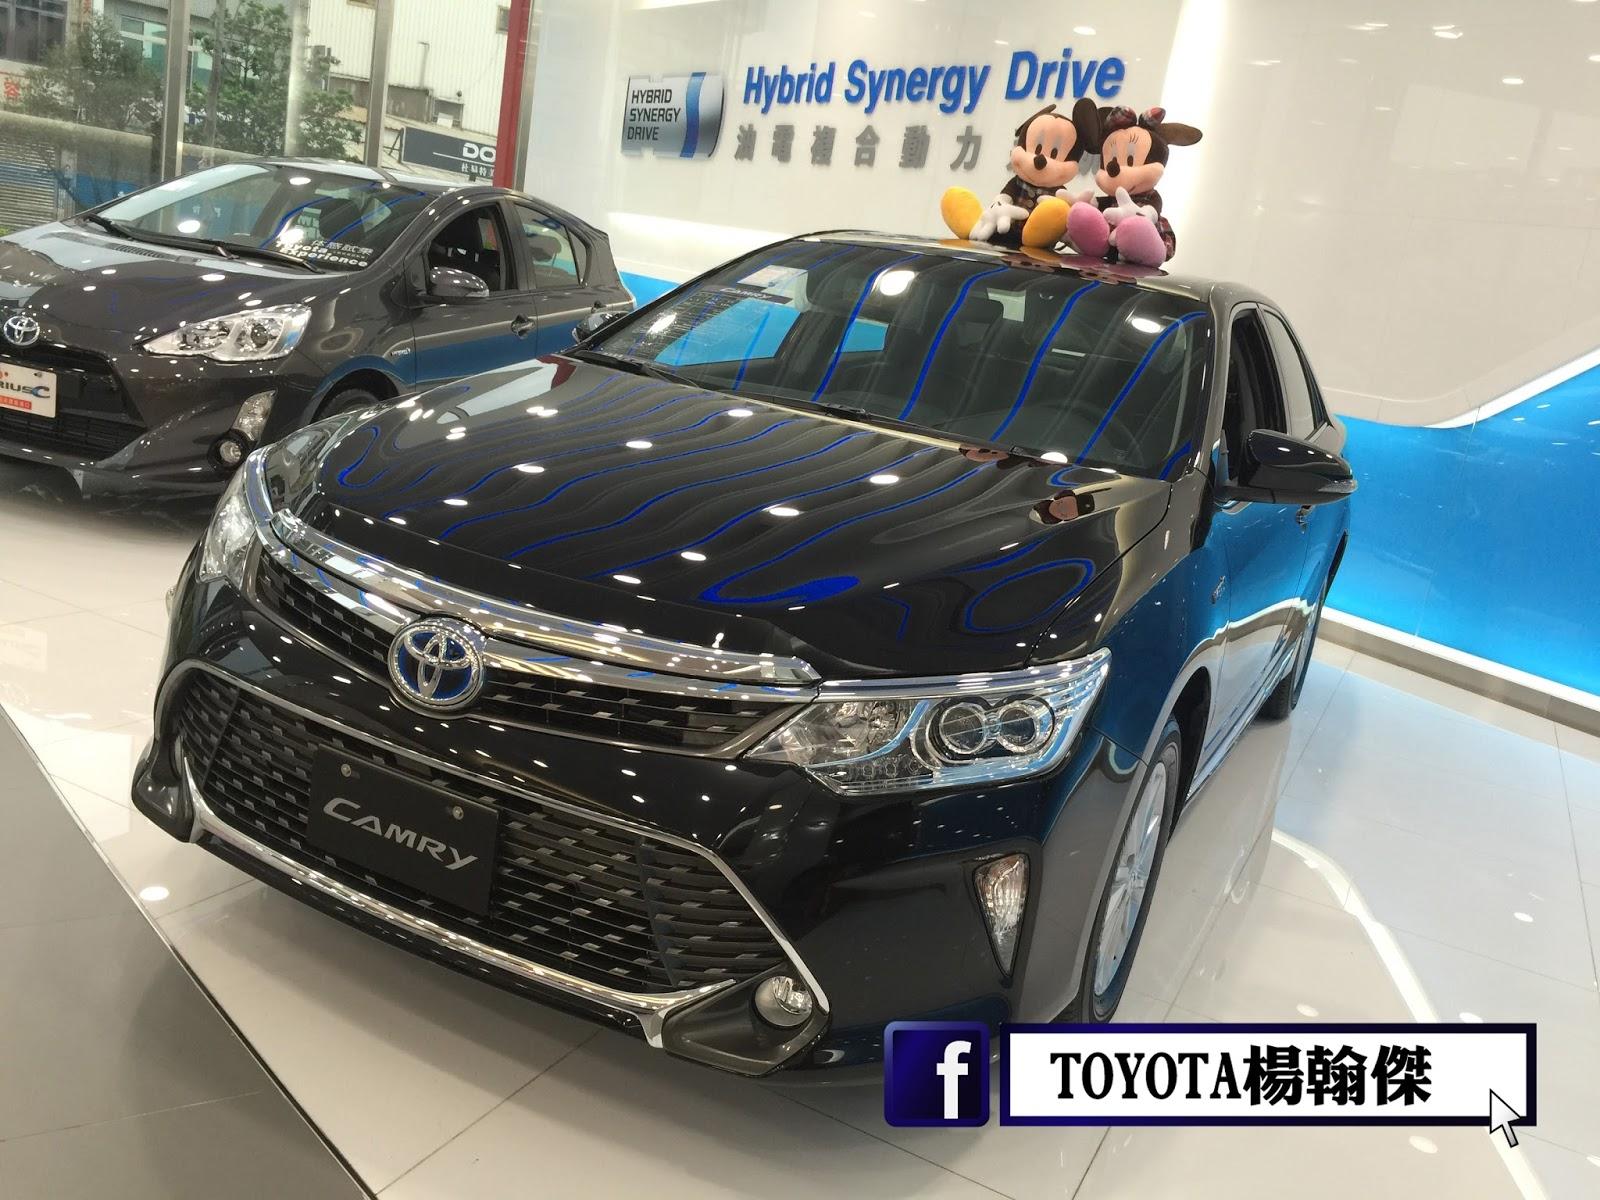 All New Camry Hybrid Indonesia Spesifikasi Kijang Innova 2014 Toyota楊翰傑 您購車保險信賴的好朋友 2016 Hybrid油電車開箱文